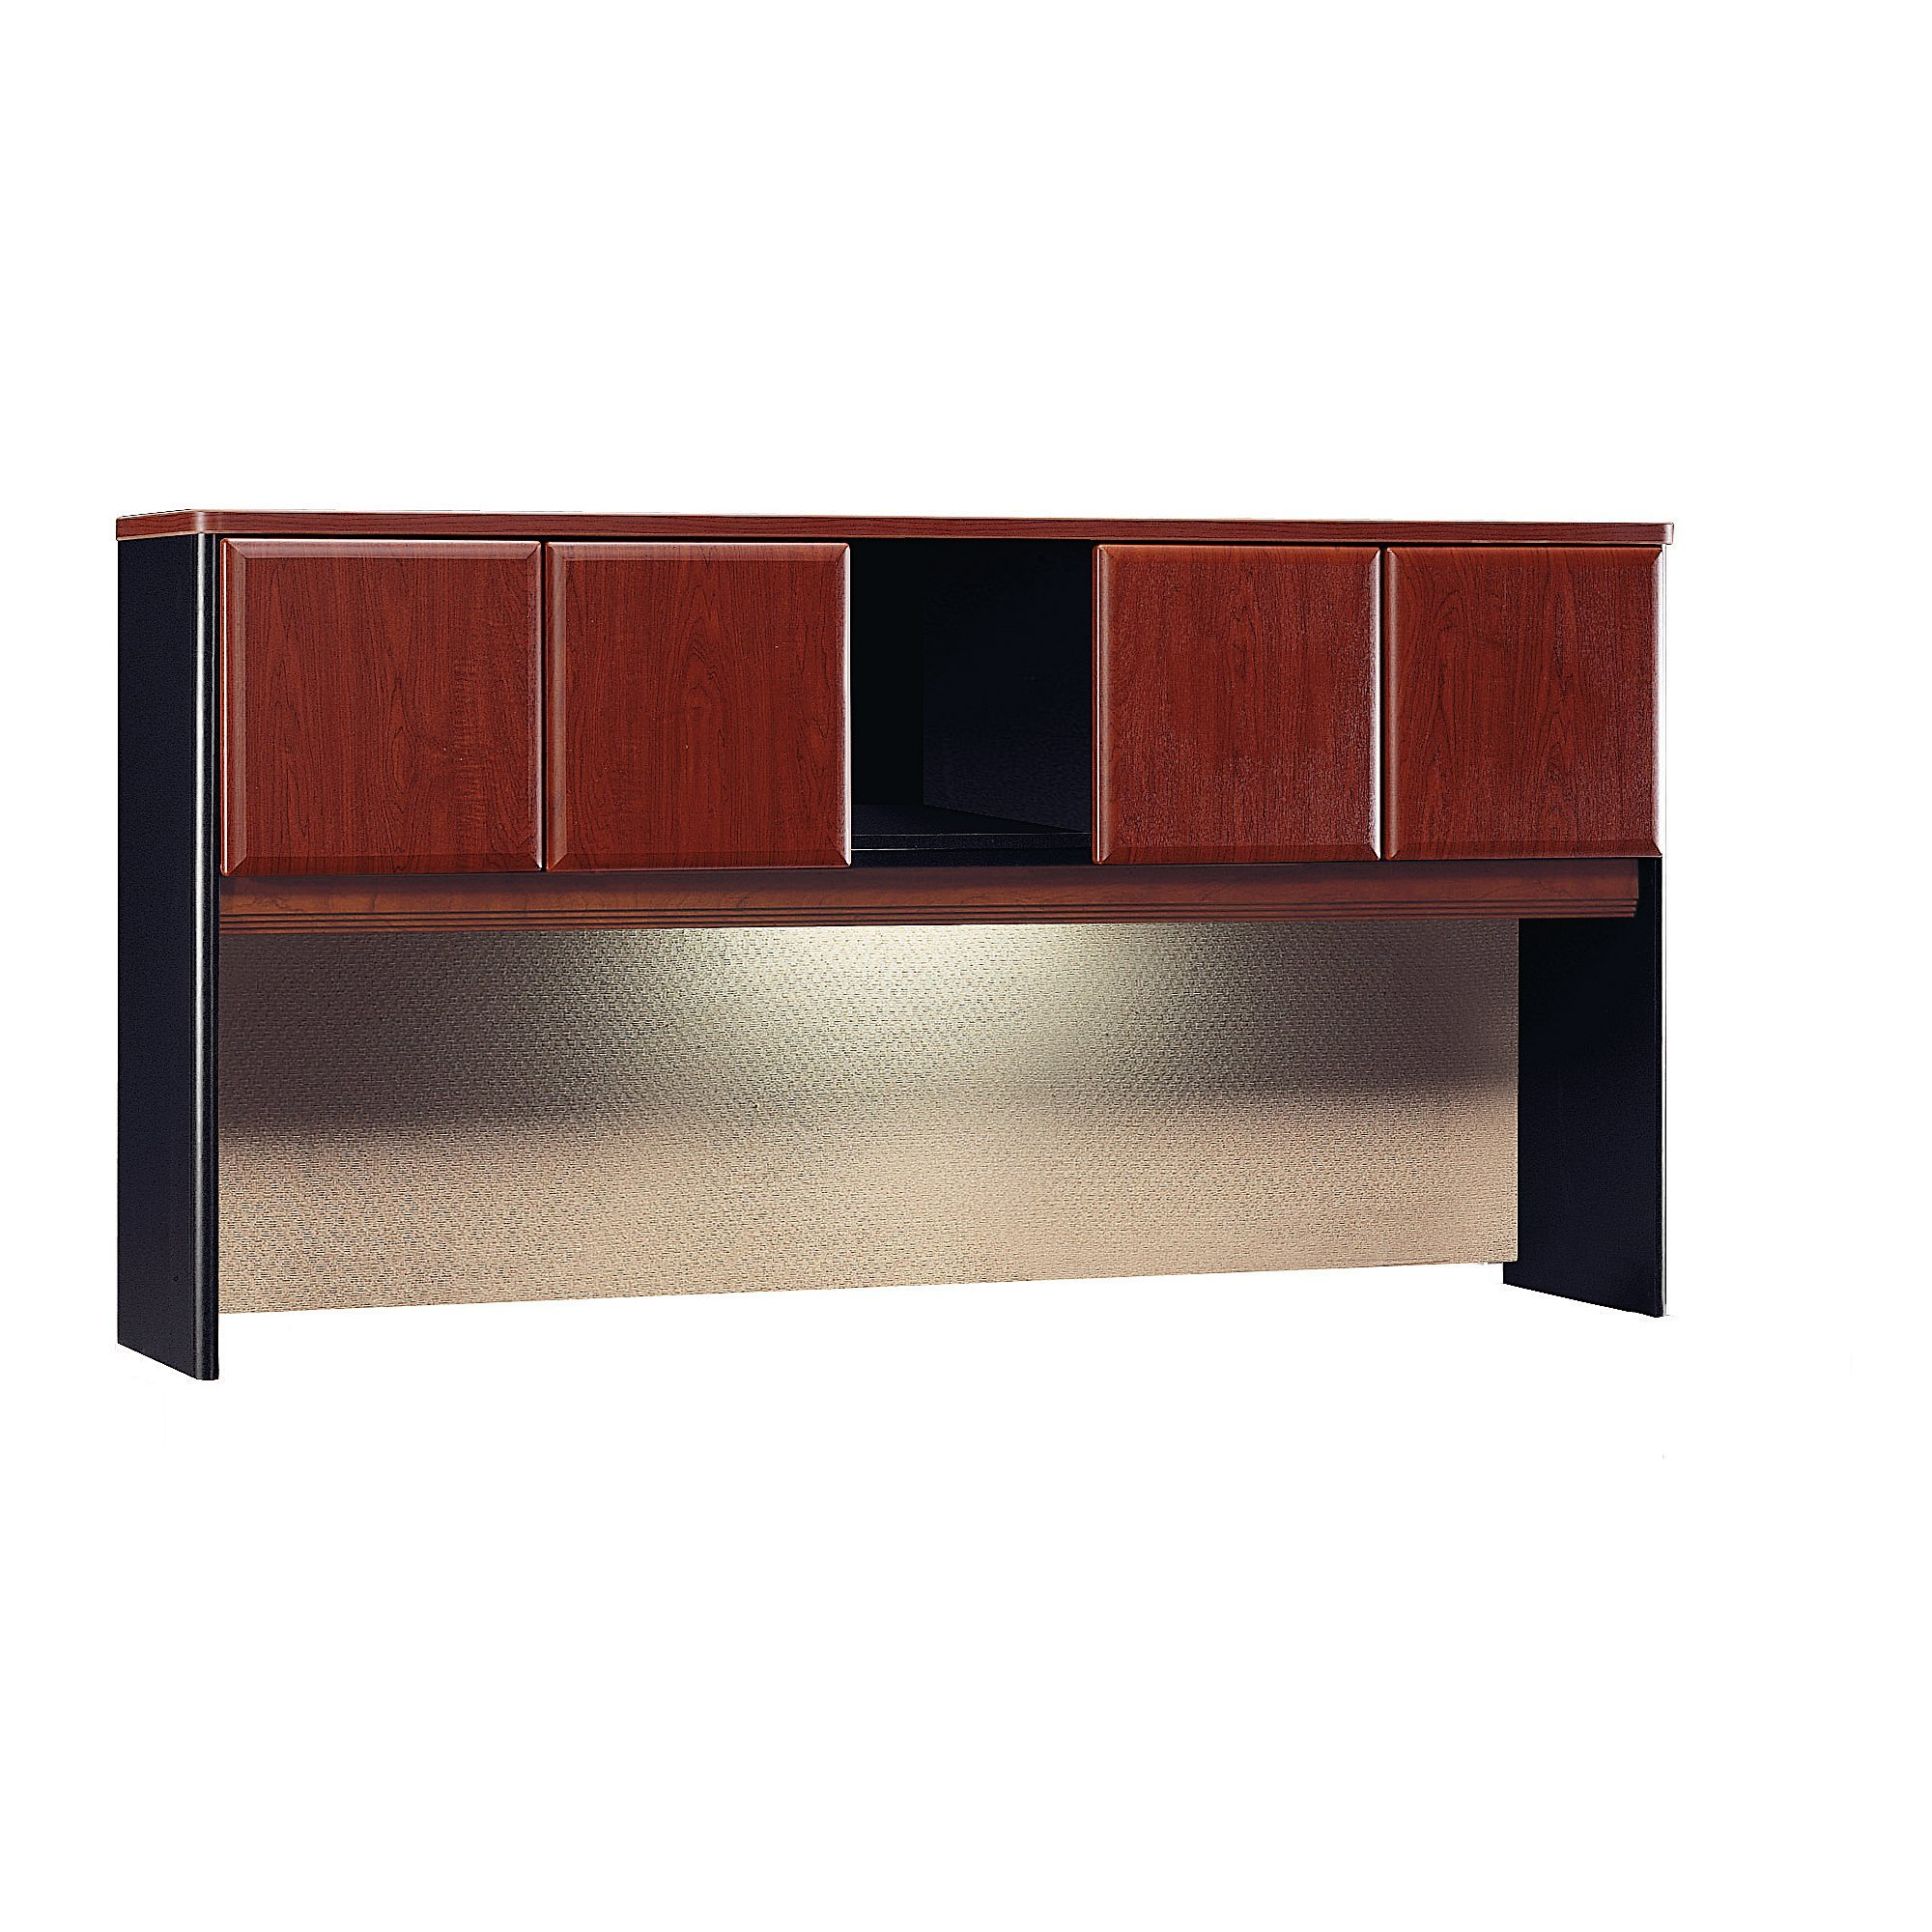 Bush Business Furniture Series A 72W Hutch - Hansen Cherry/Galaxy 72W X 14D X 37H Ergonomichome American Made TAA Compliant